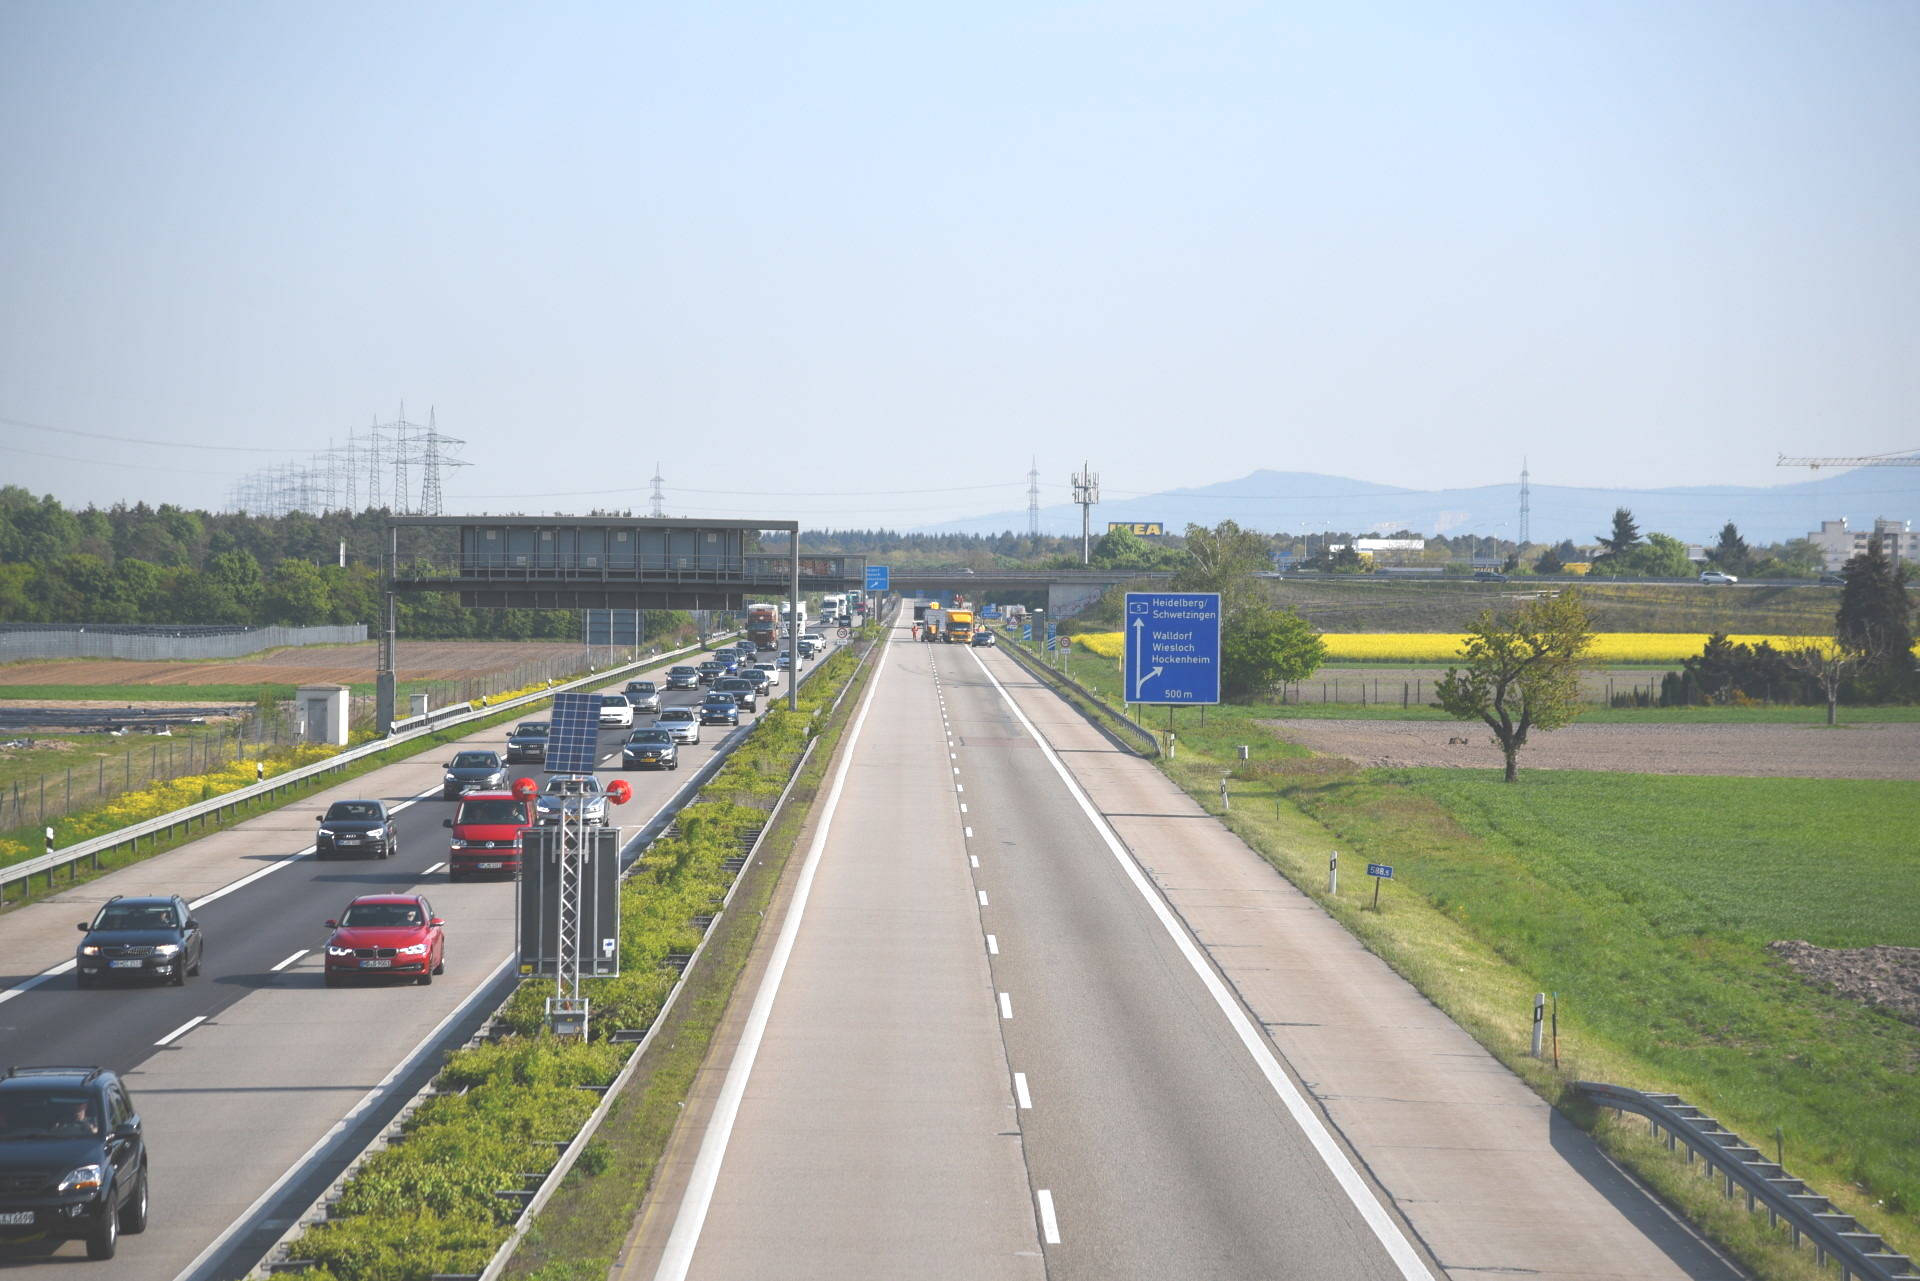 Autobahnkreuz Walldorf